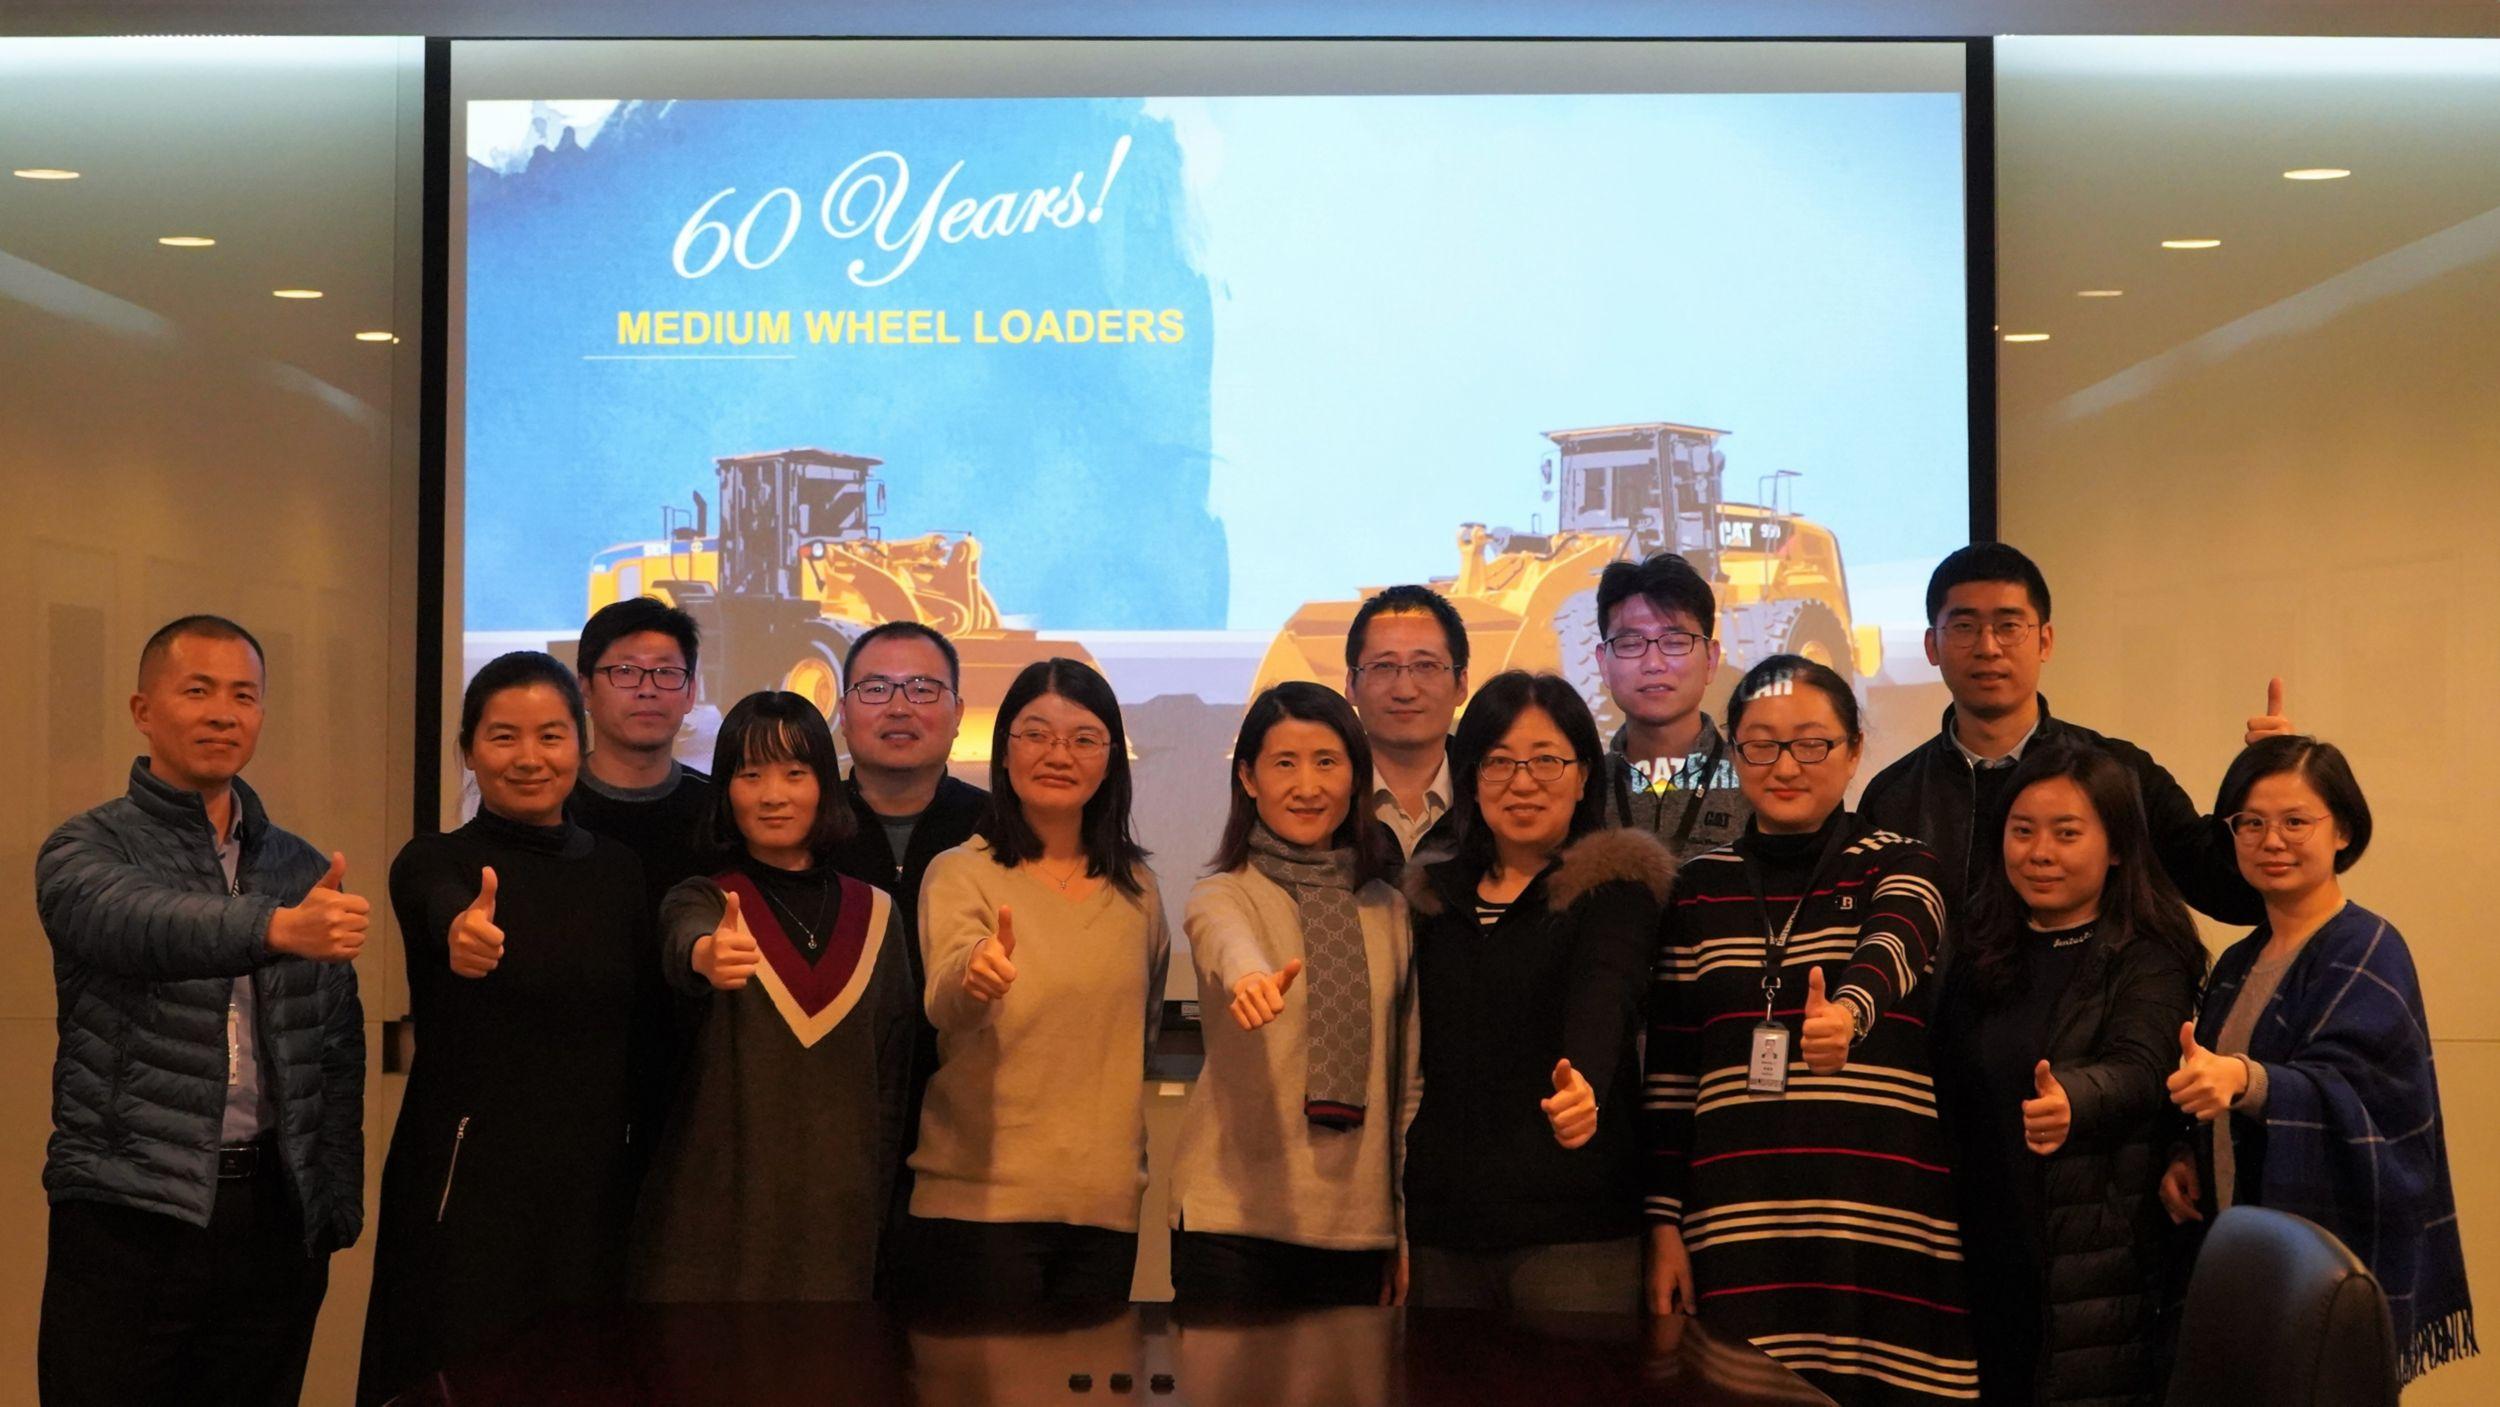 Suzhou Team 60 Year Celebration